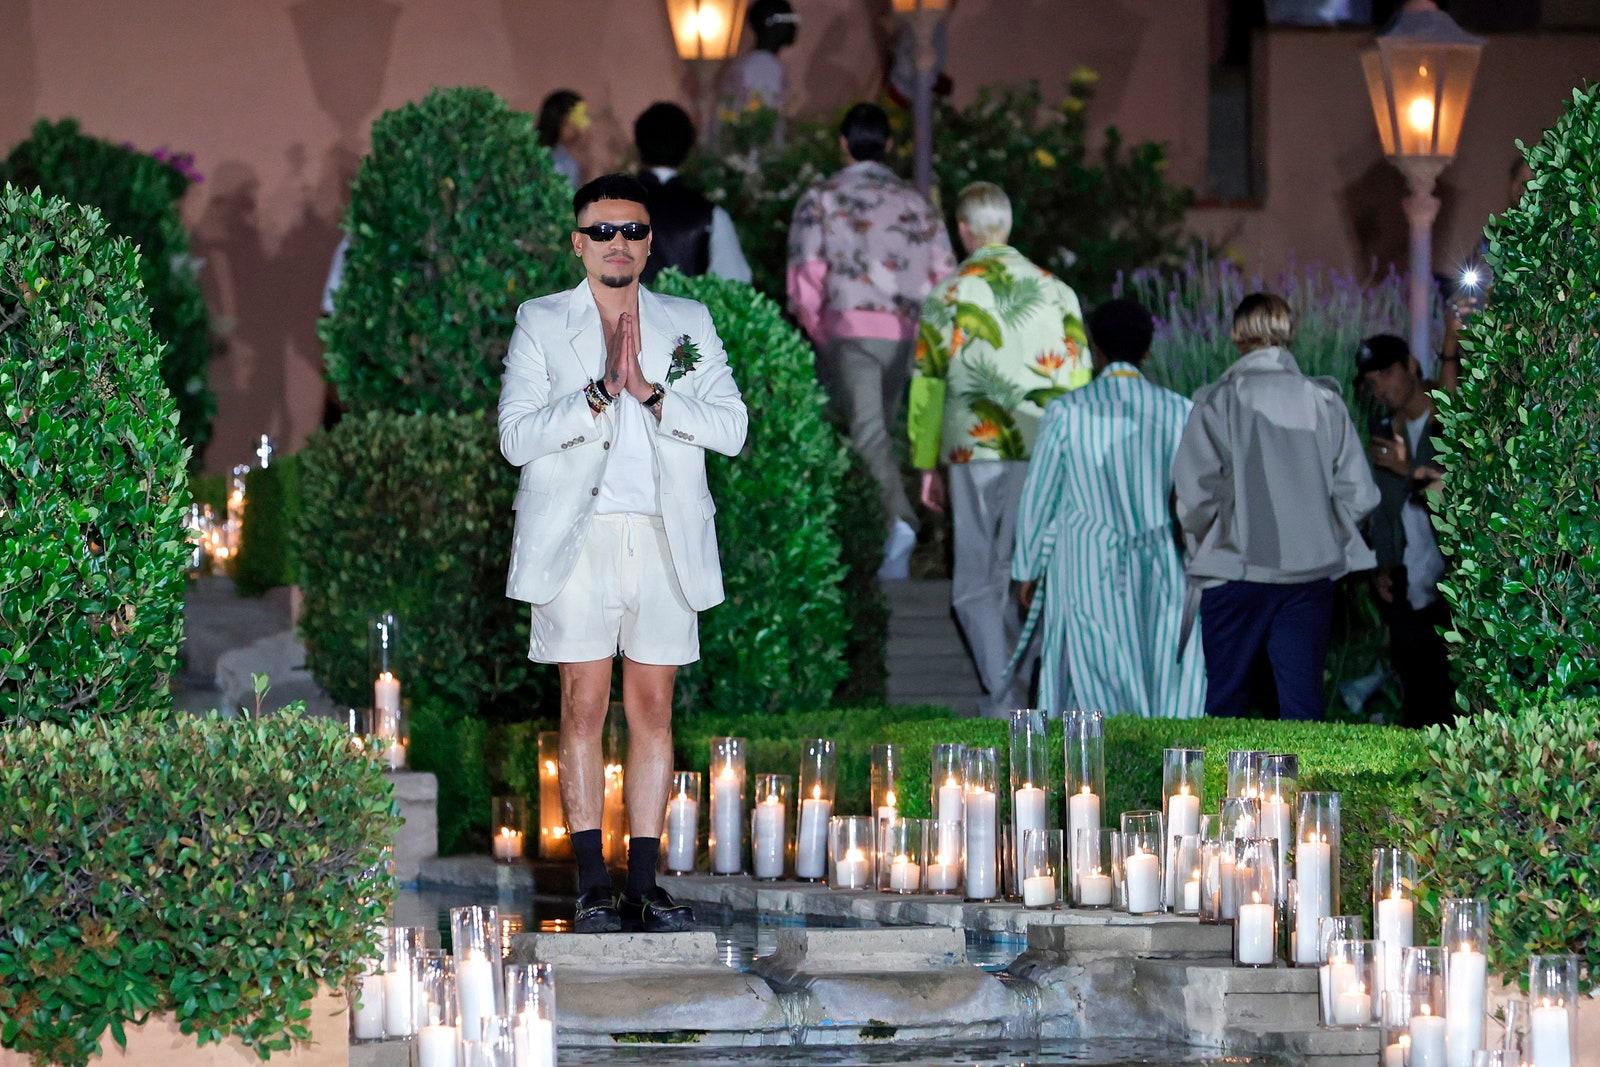 Rhude designer Rhuigi Villaseor takes his postshow bow in shorts.